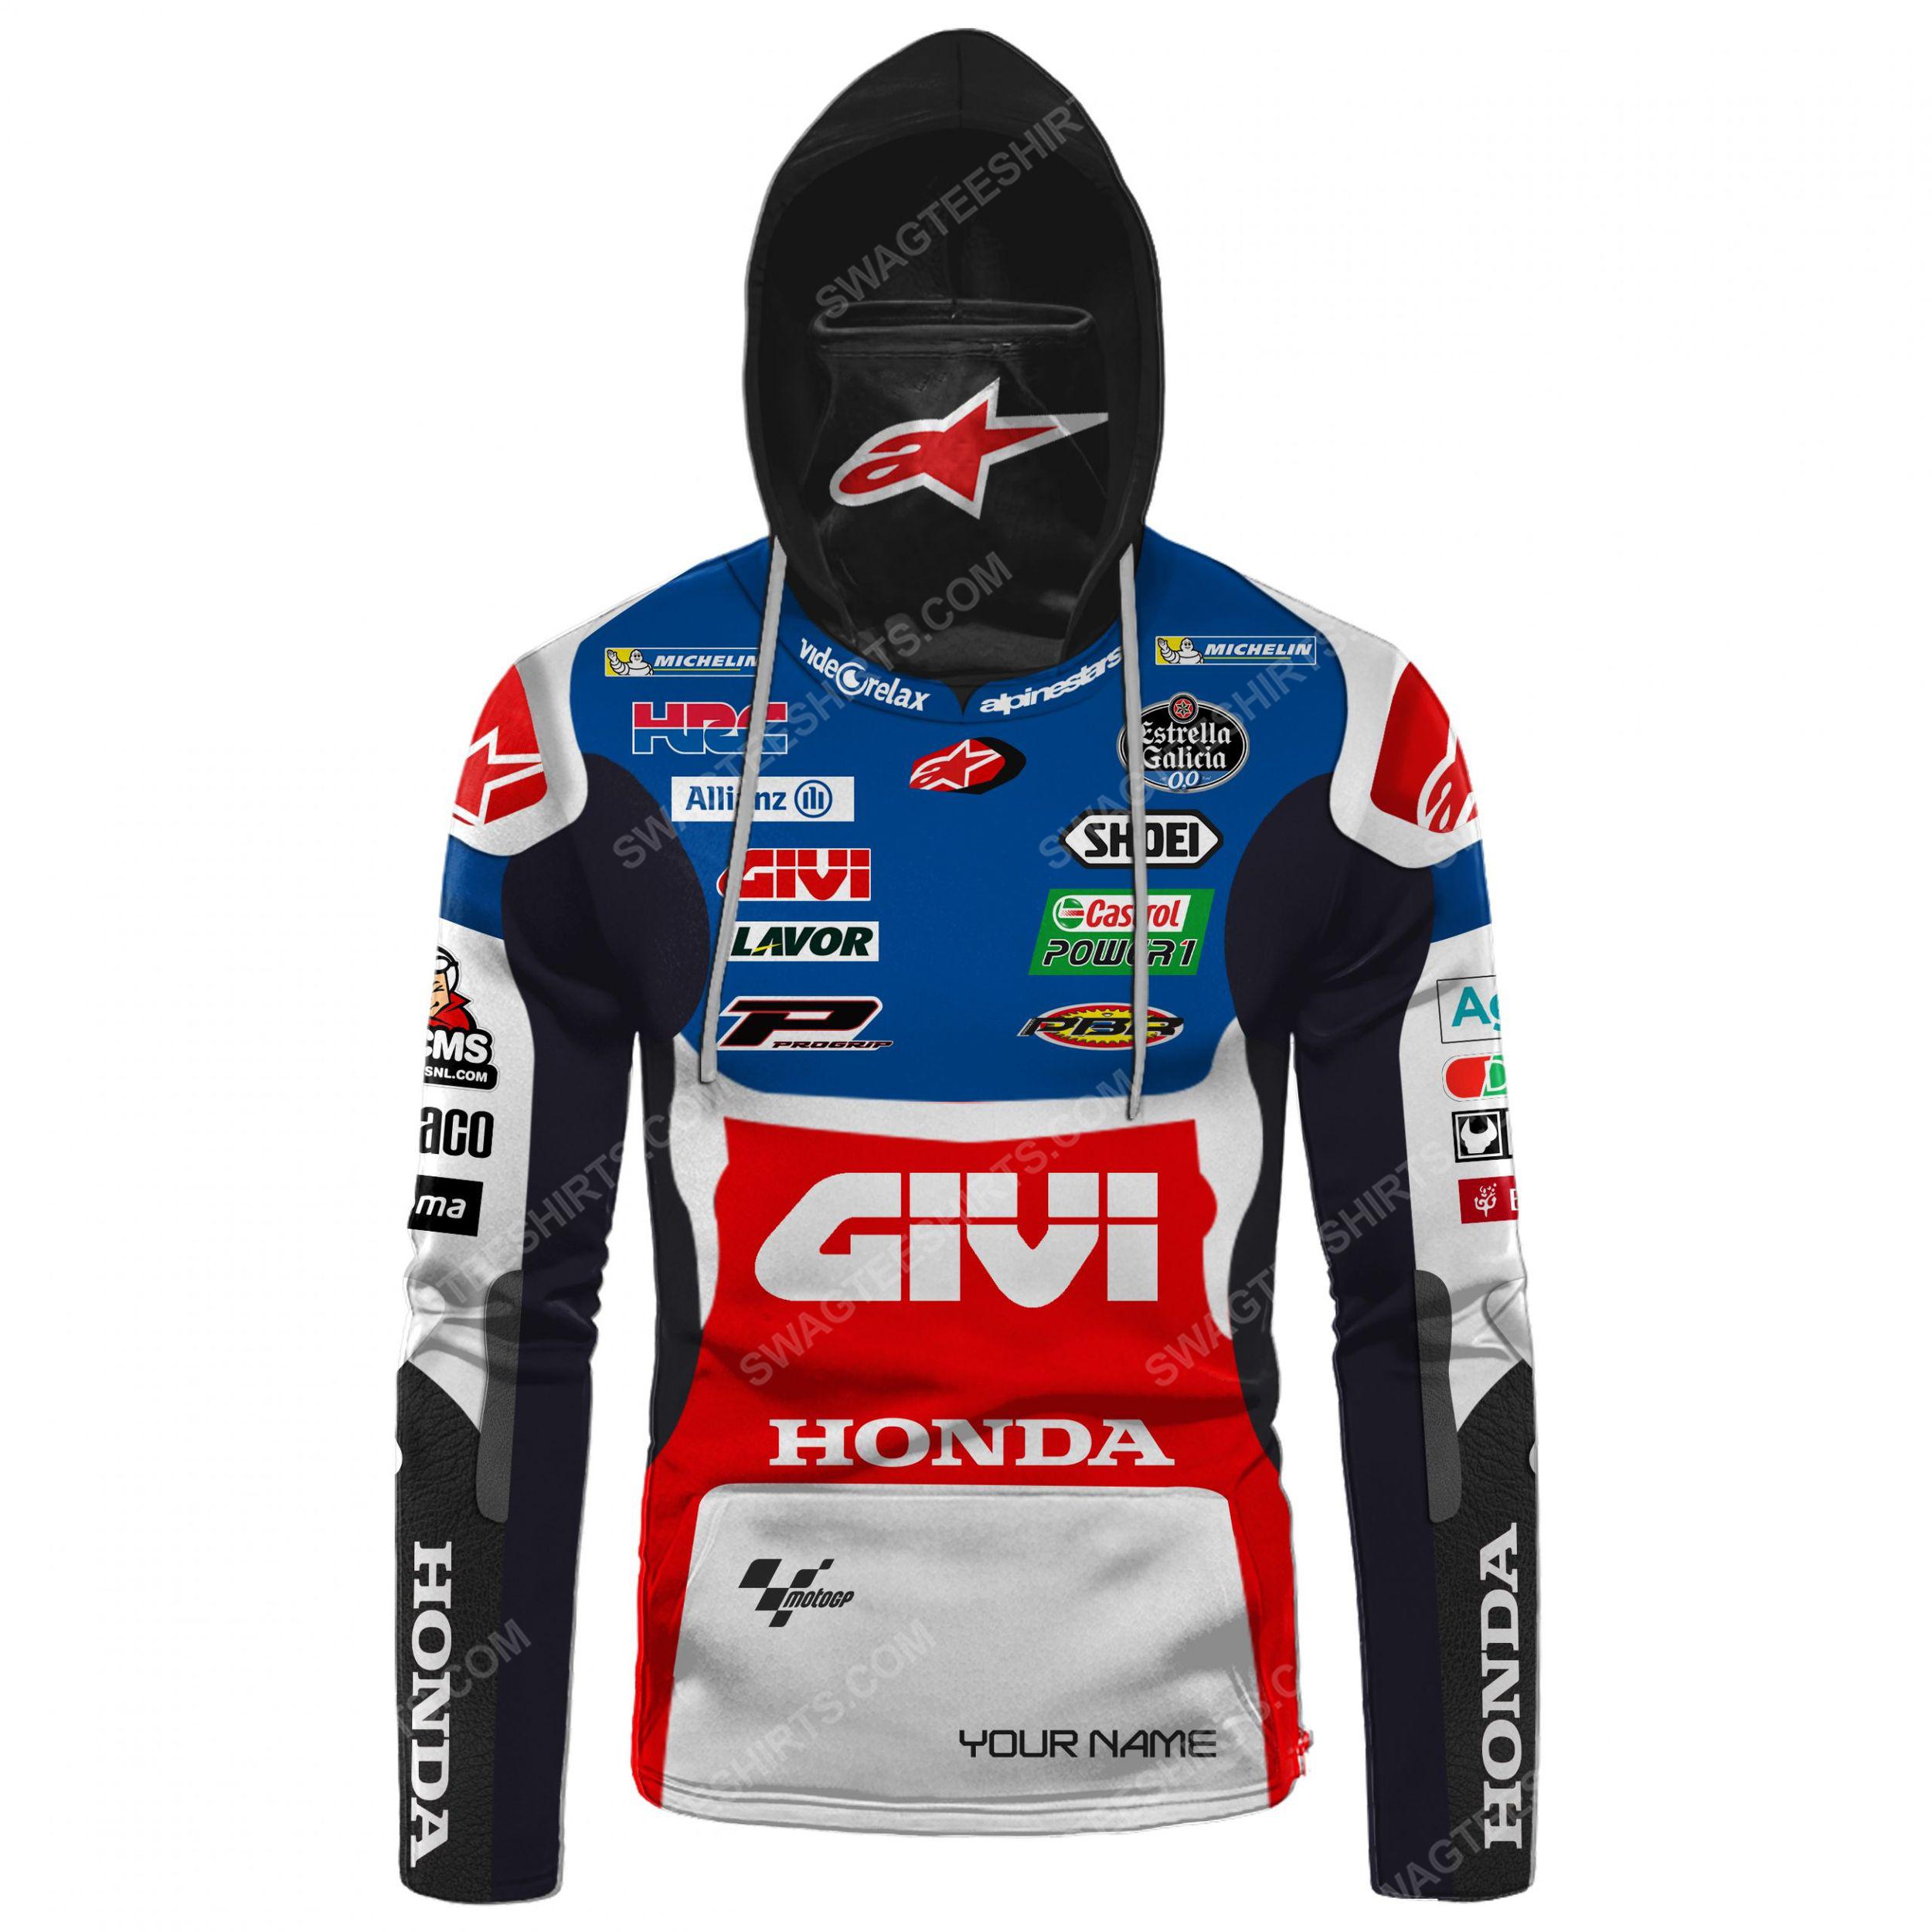 Custom name castrol power honda racing full print mask hoodie 2(1) - Copy